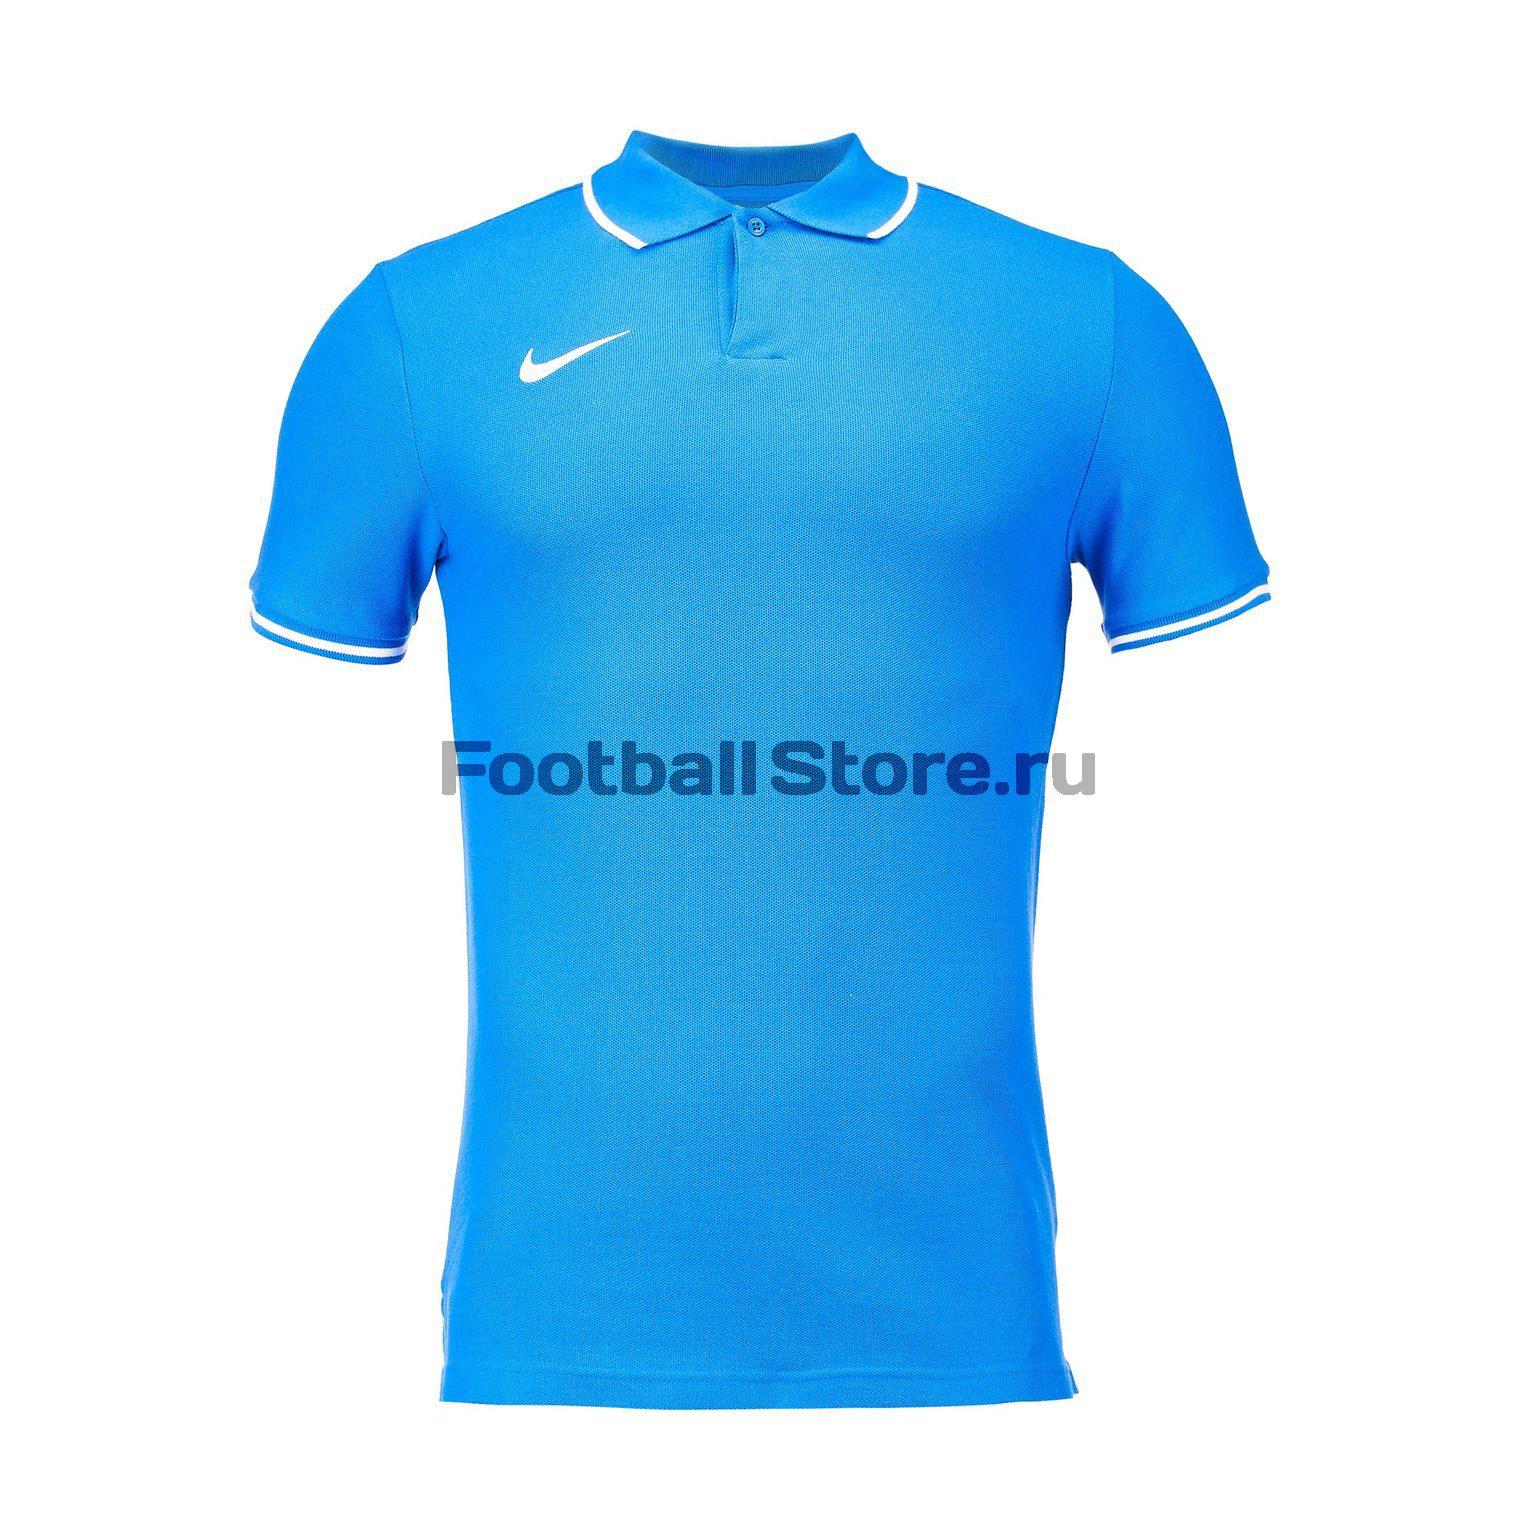 Поло Nike M Polo Club19 SS AJ1502-463 футболка хлопковая nike tee club19 ss aj1504 451